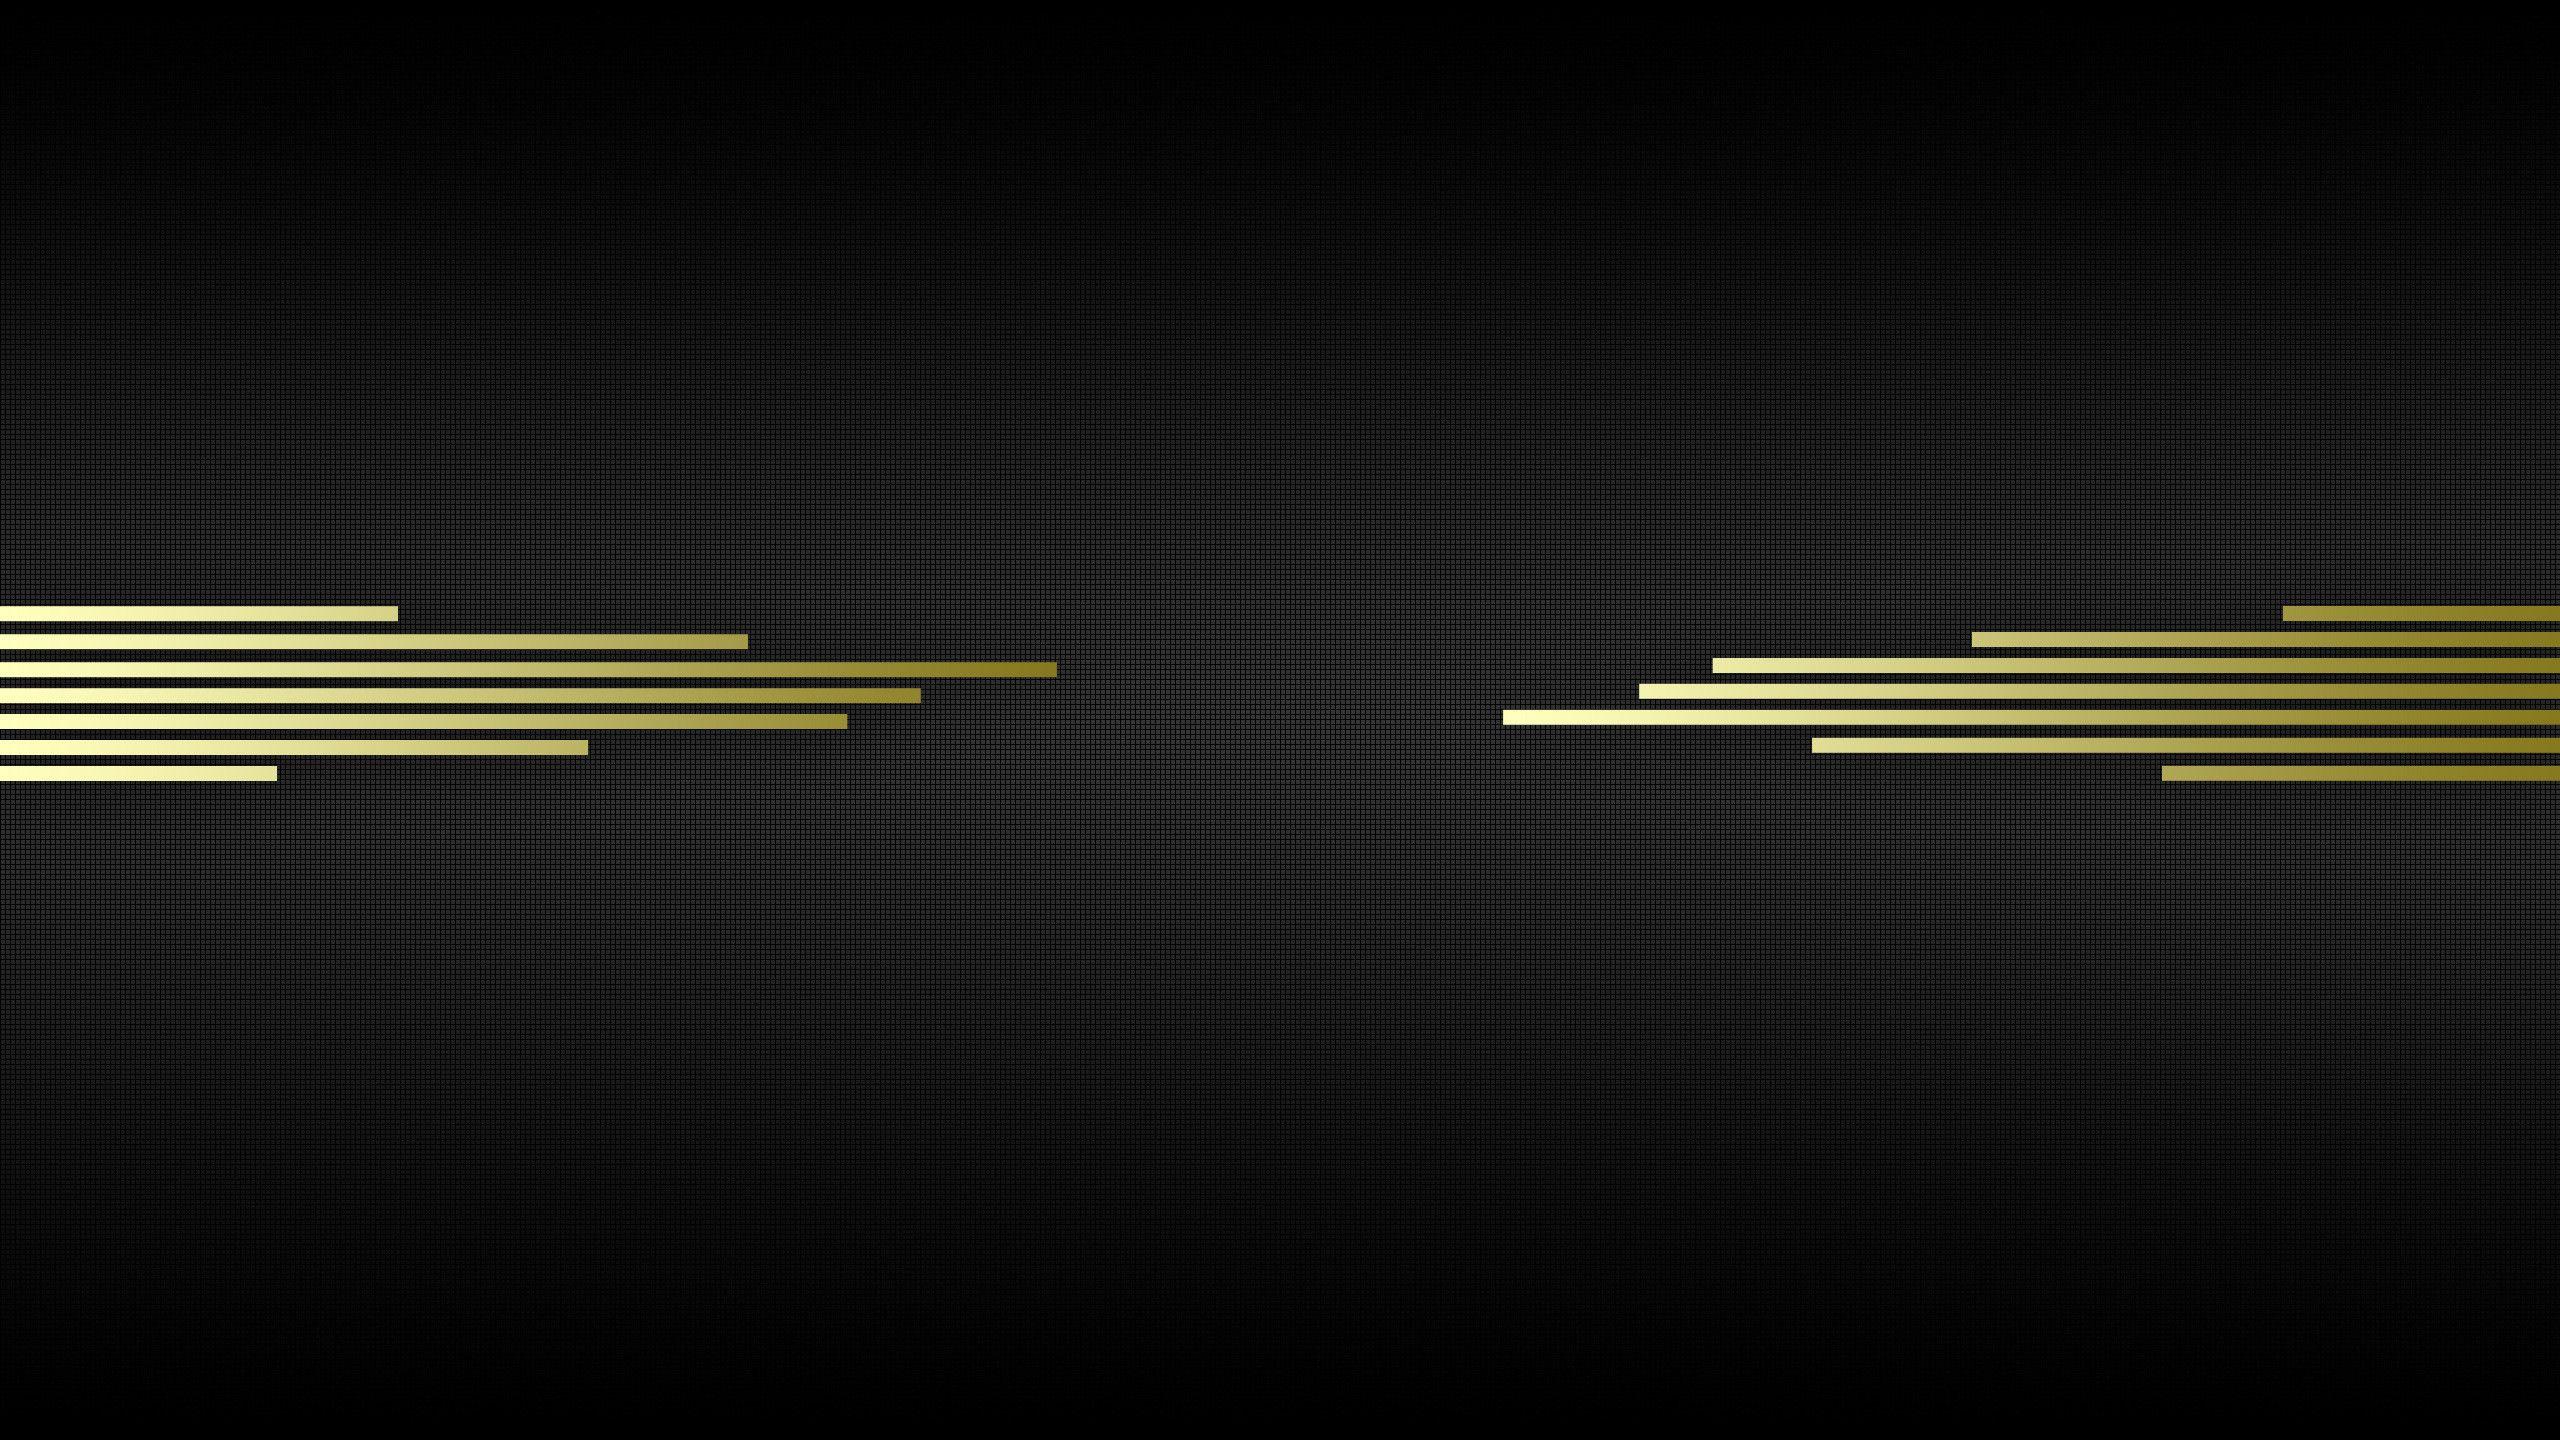 2560x1440 Simple Music Background Image HD Desktop